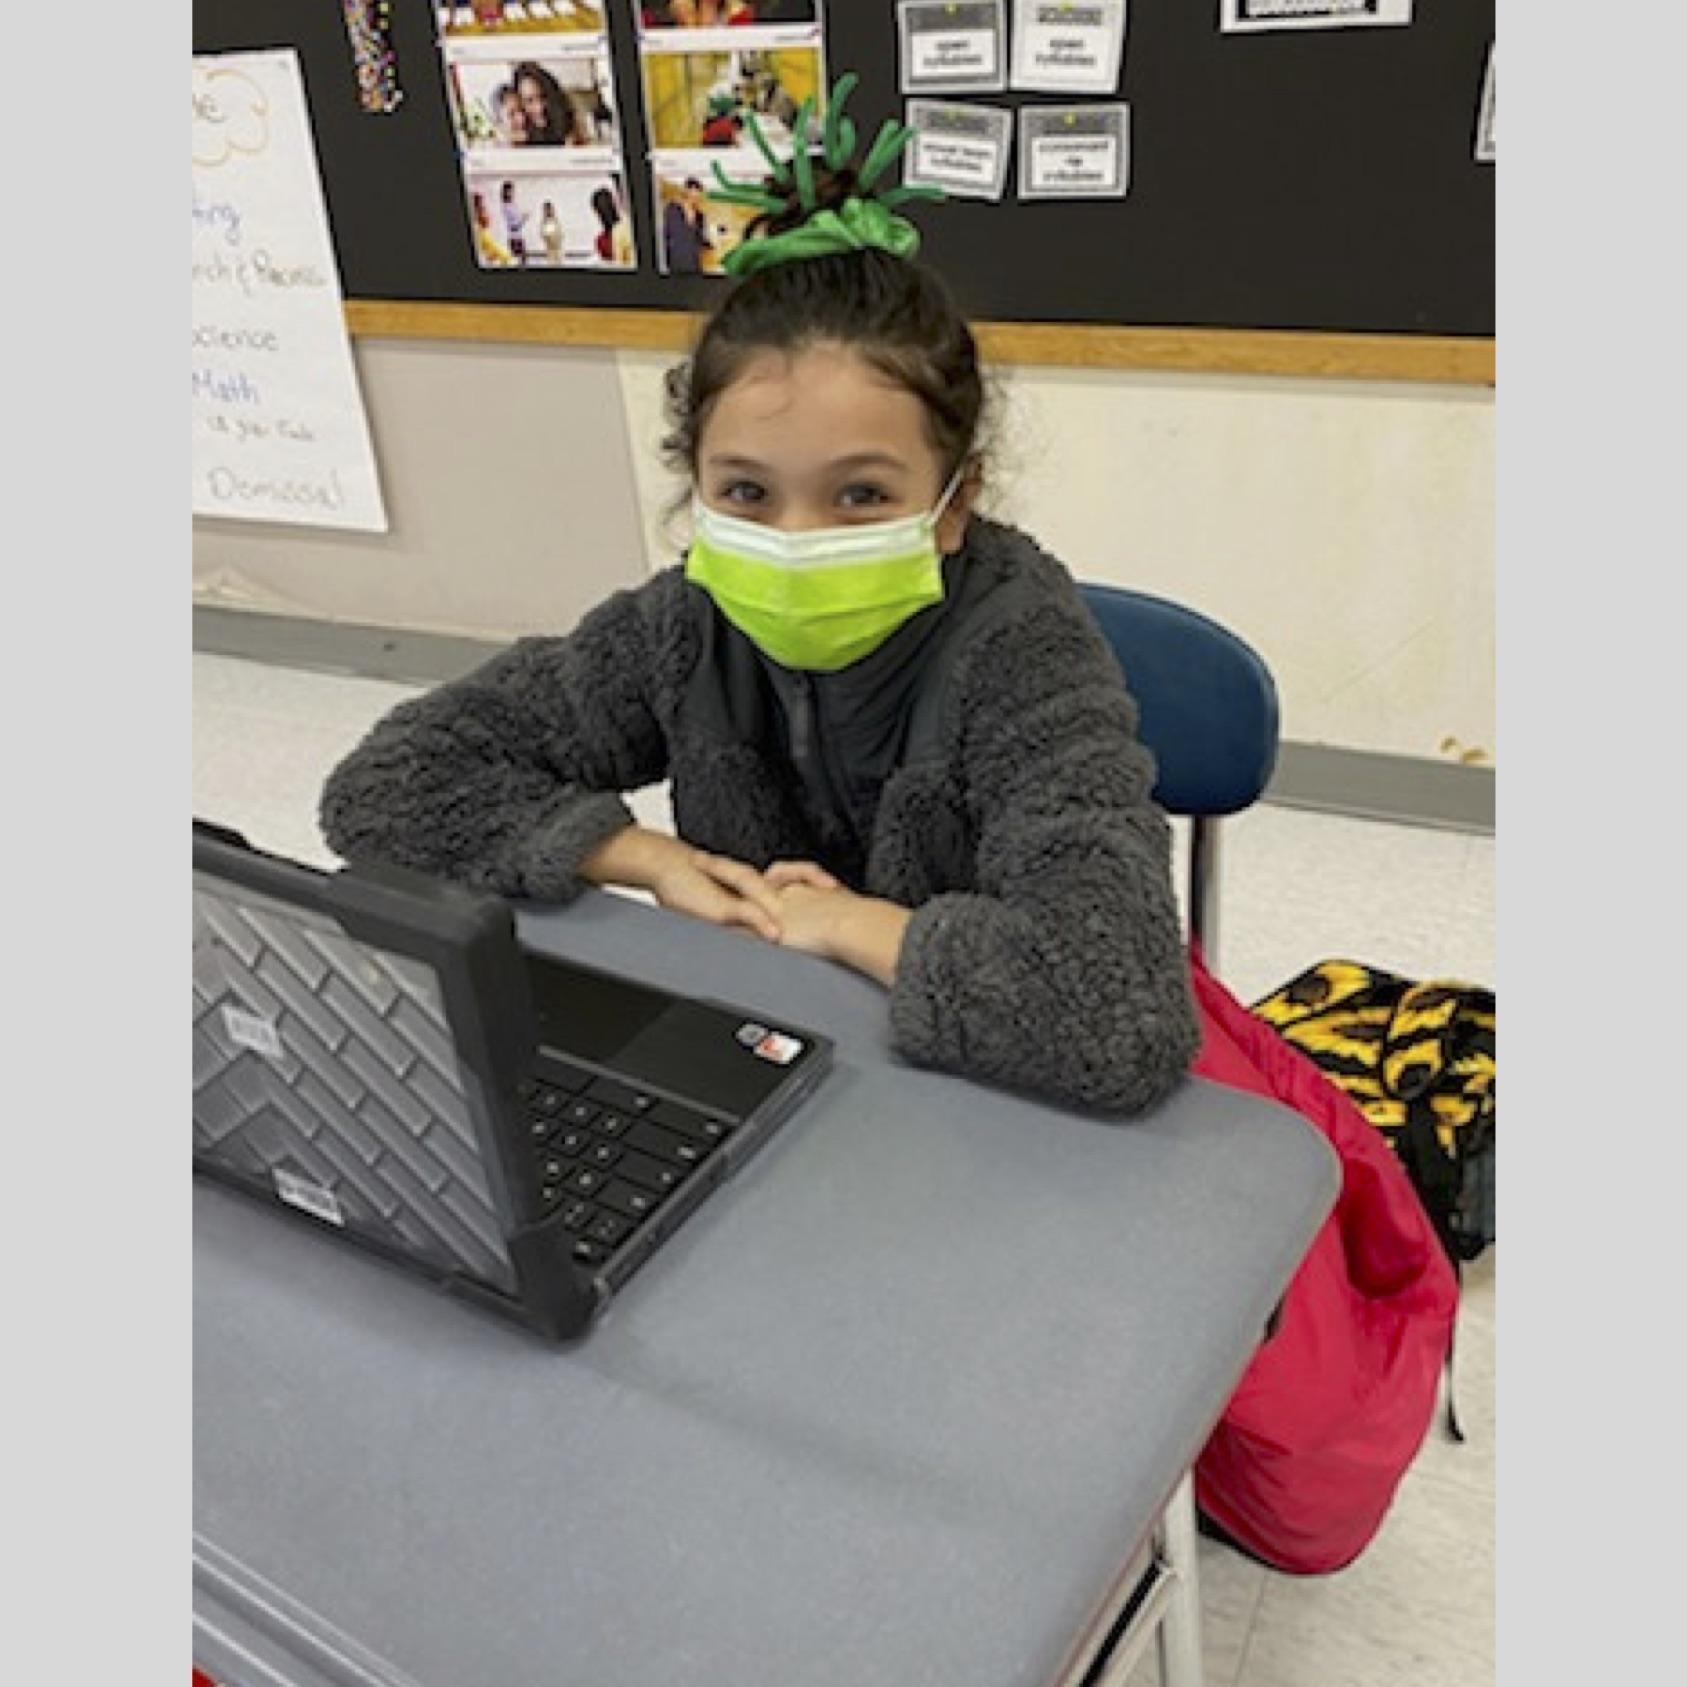 A student at Charlton Street Elementary School